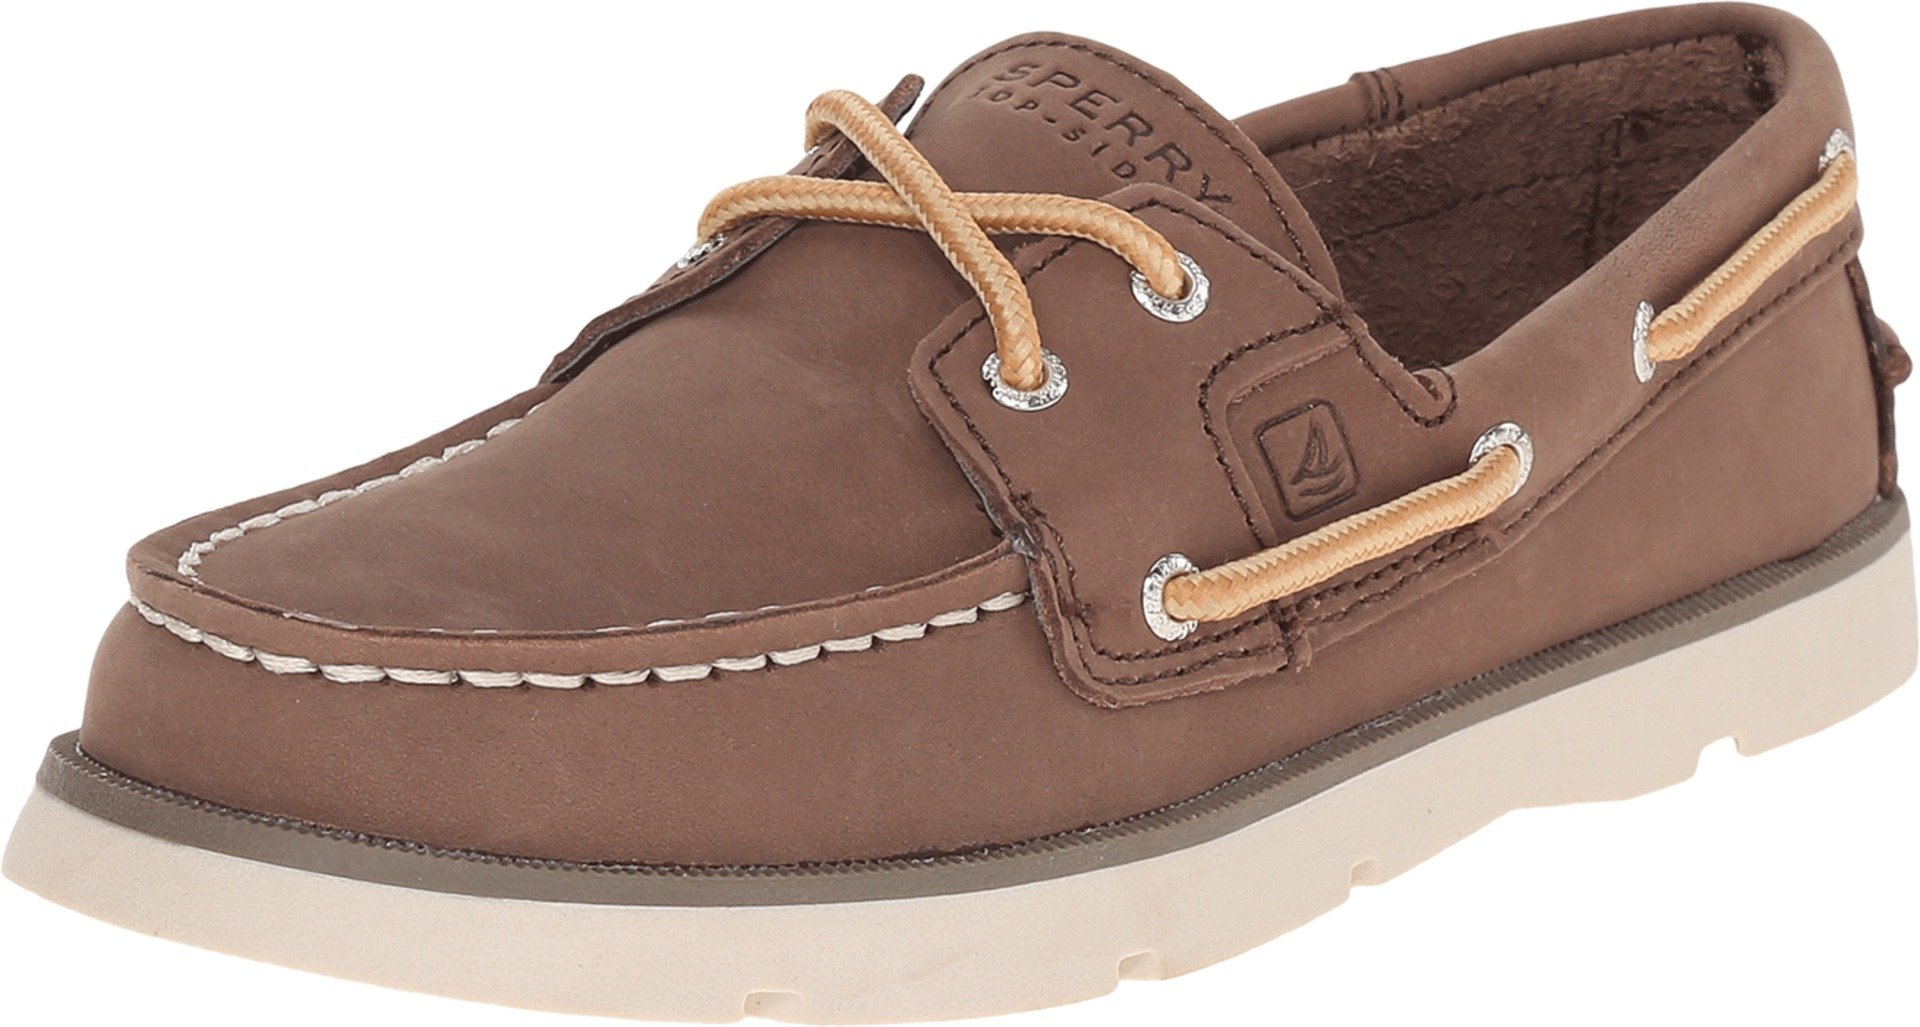 SPERRY Boy's, Leeward Boat Shoe Dark Brown 5 M